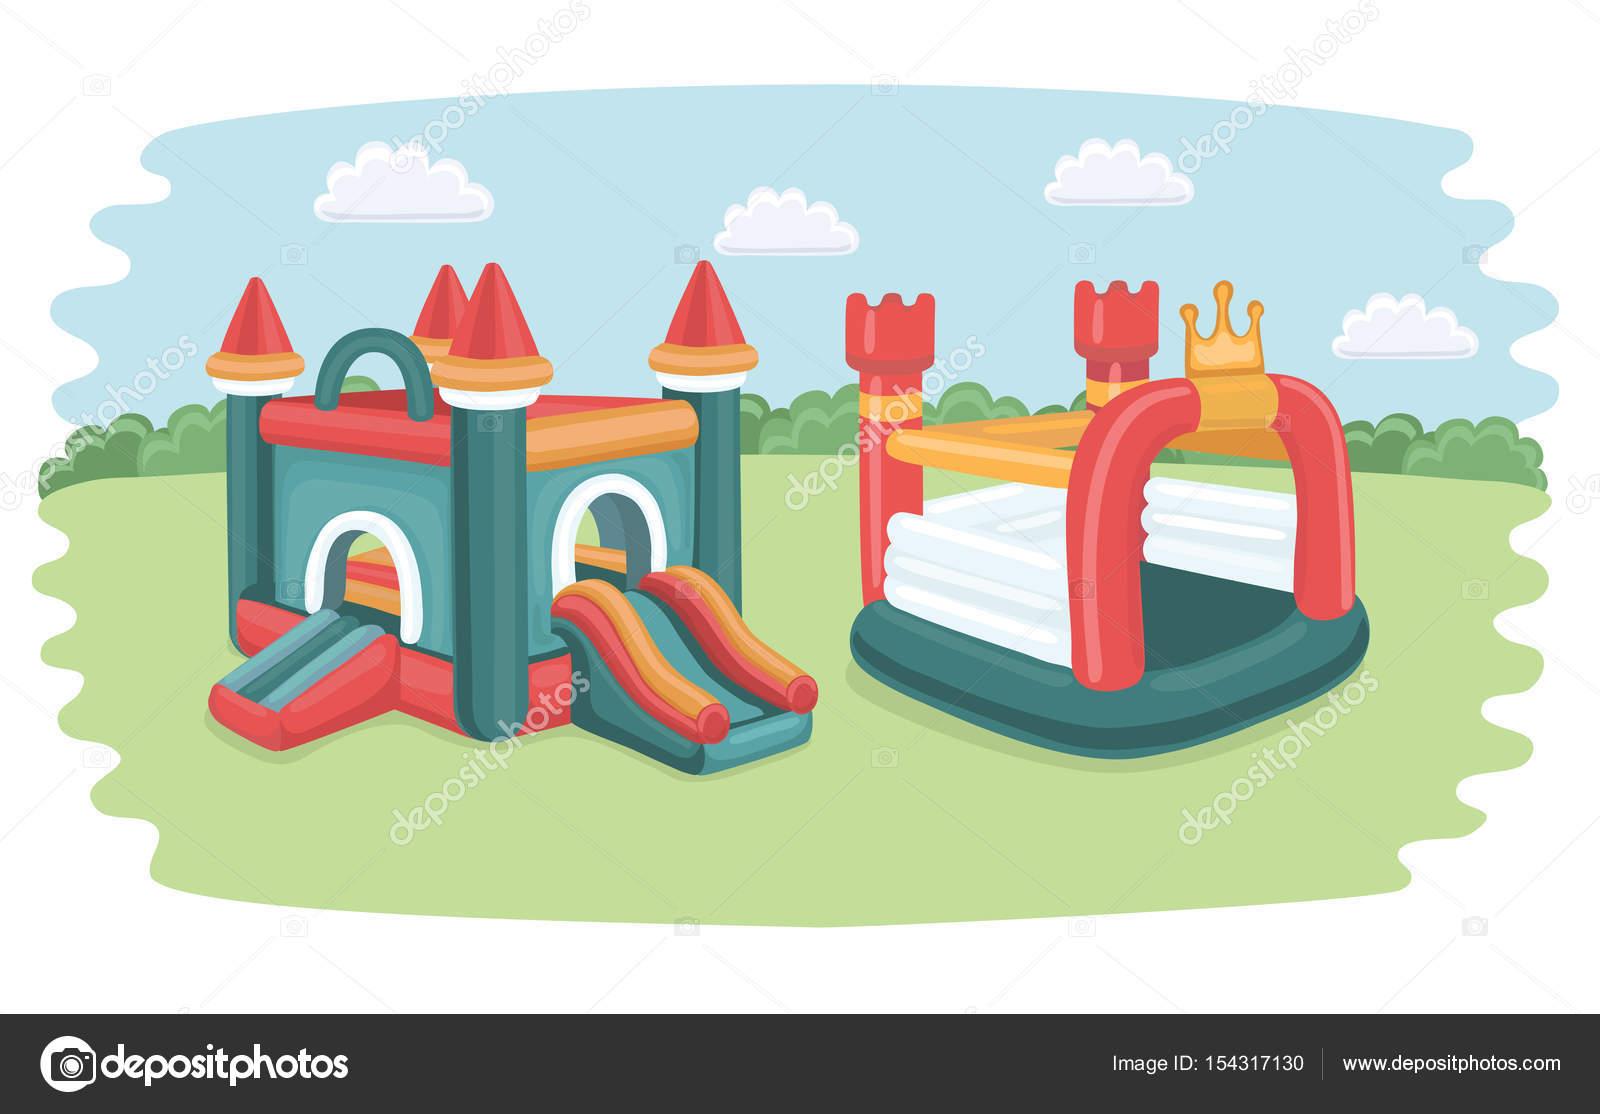 Im genes inflables para ni os cartel de vector con dos for Accesorios para piscinas inflables